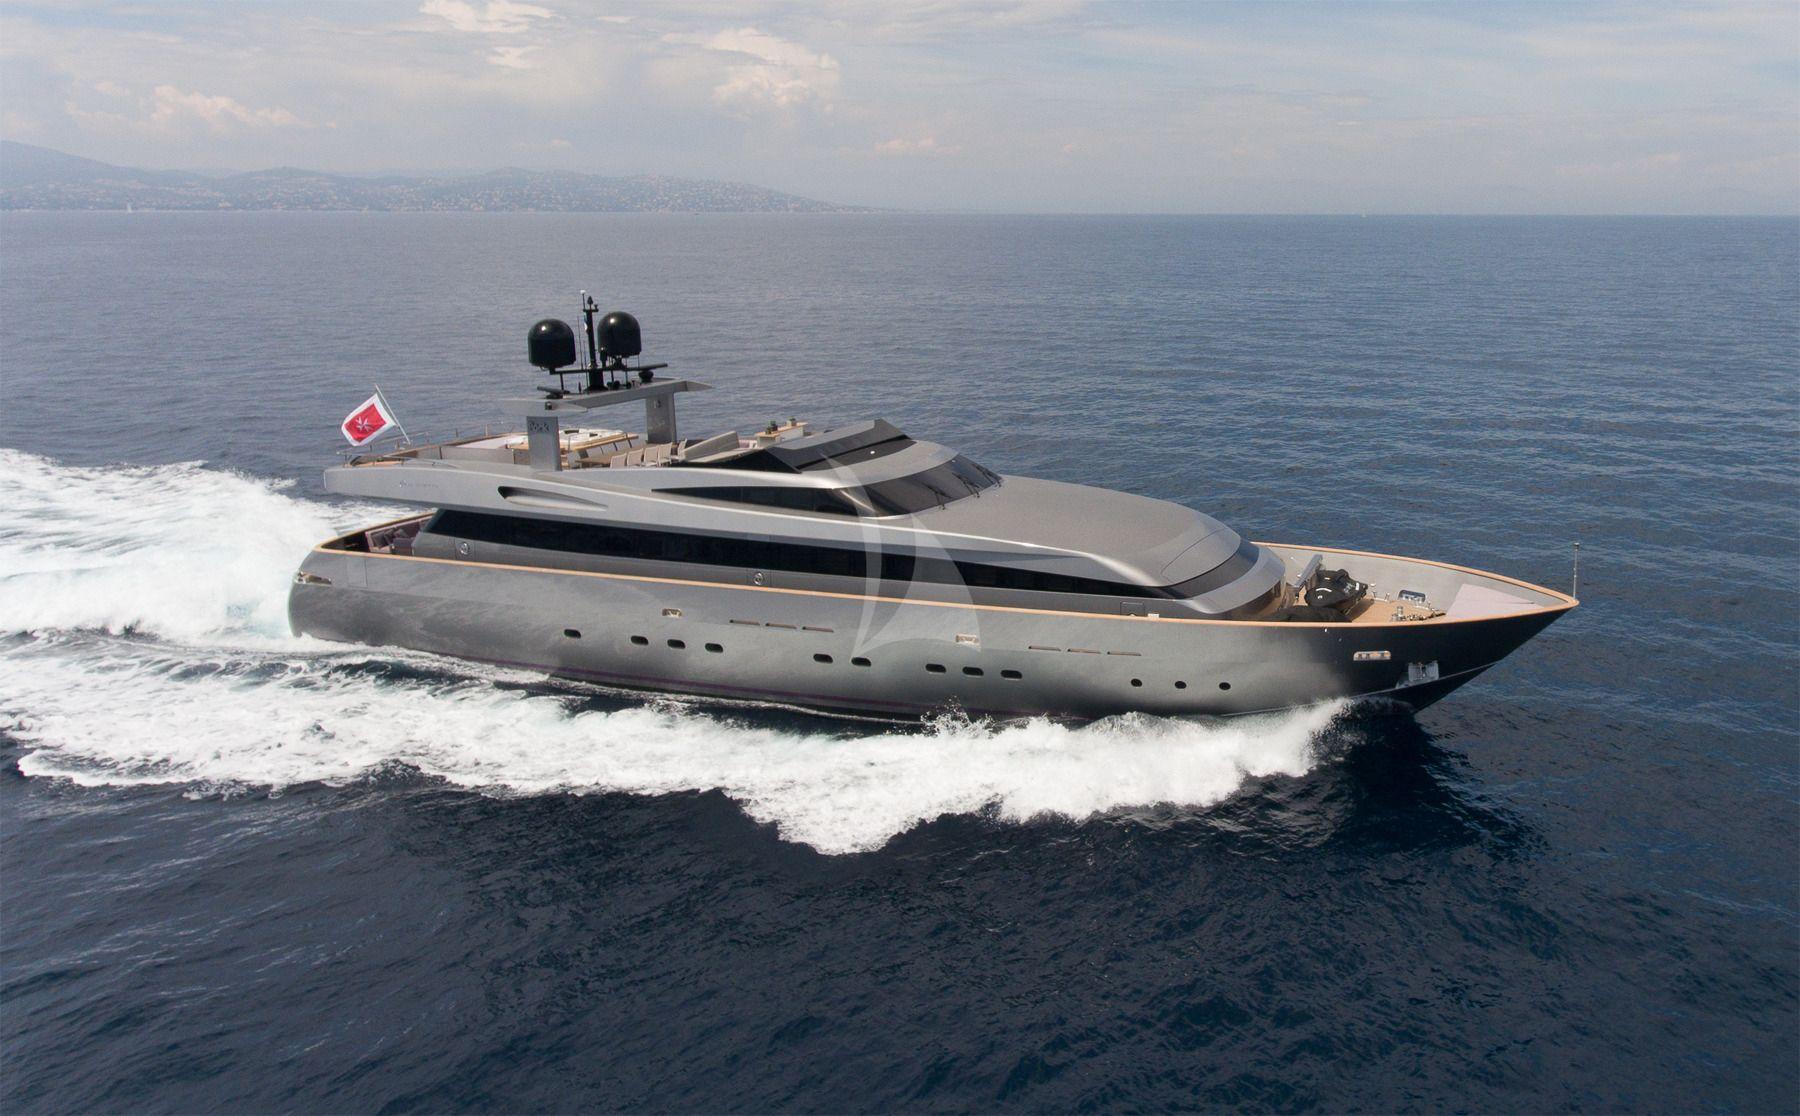 IROCK - Baglietto 112 - 5 Cabins - Cannes - Monaco - St Tropez - Antibes - Porto Cervo